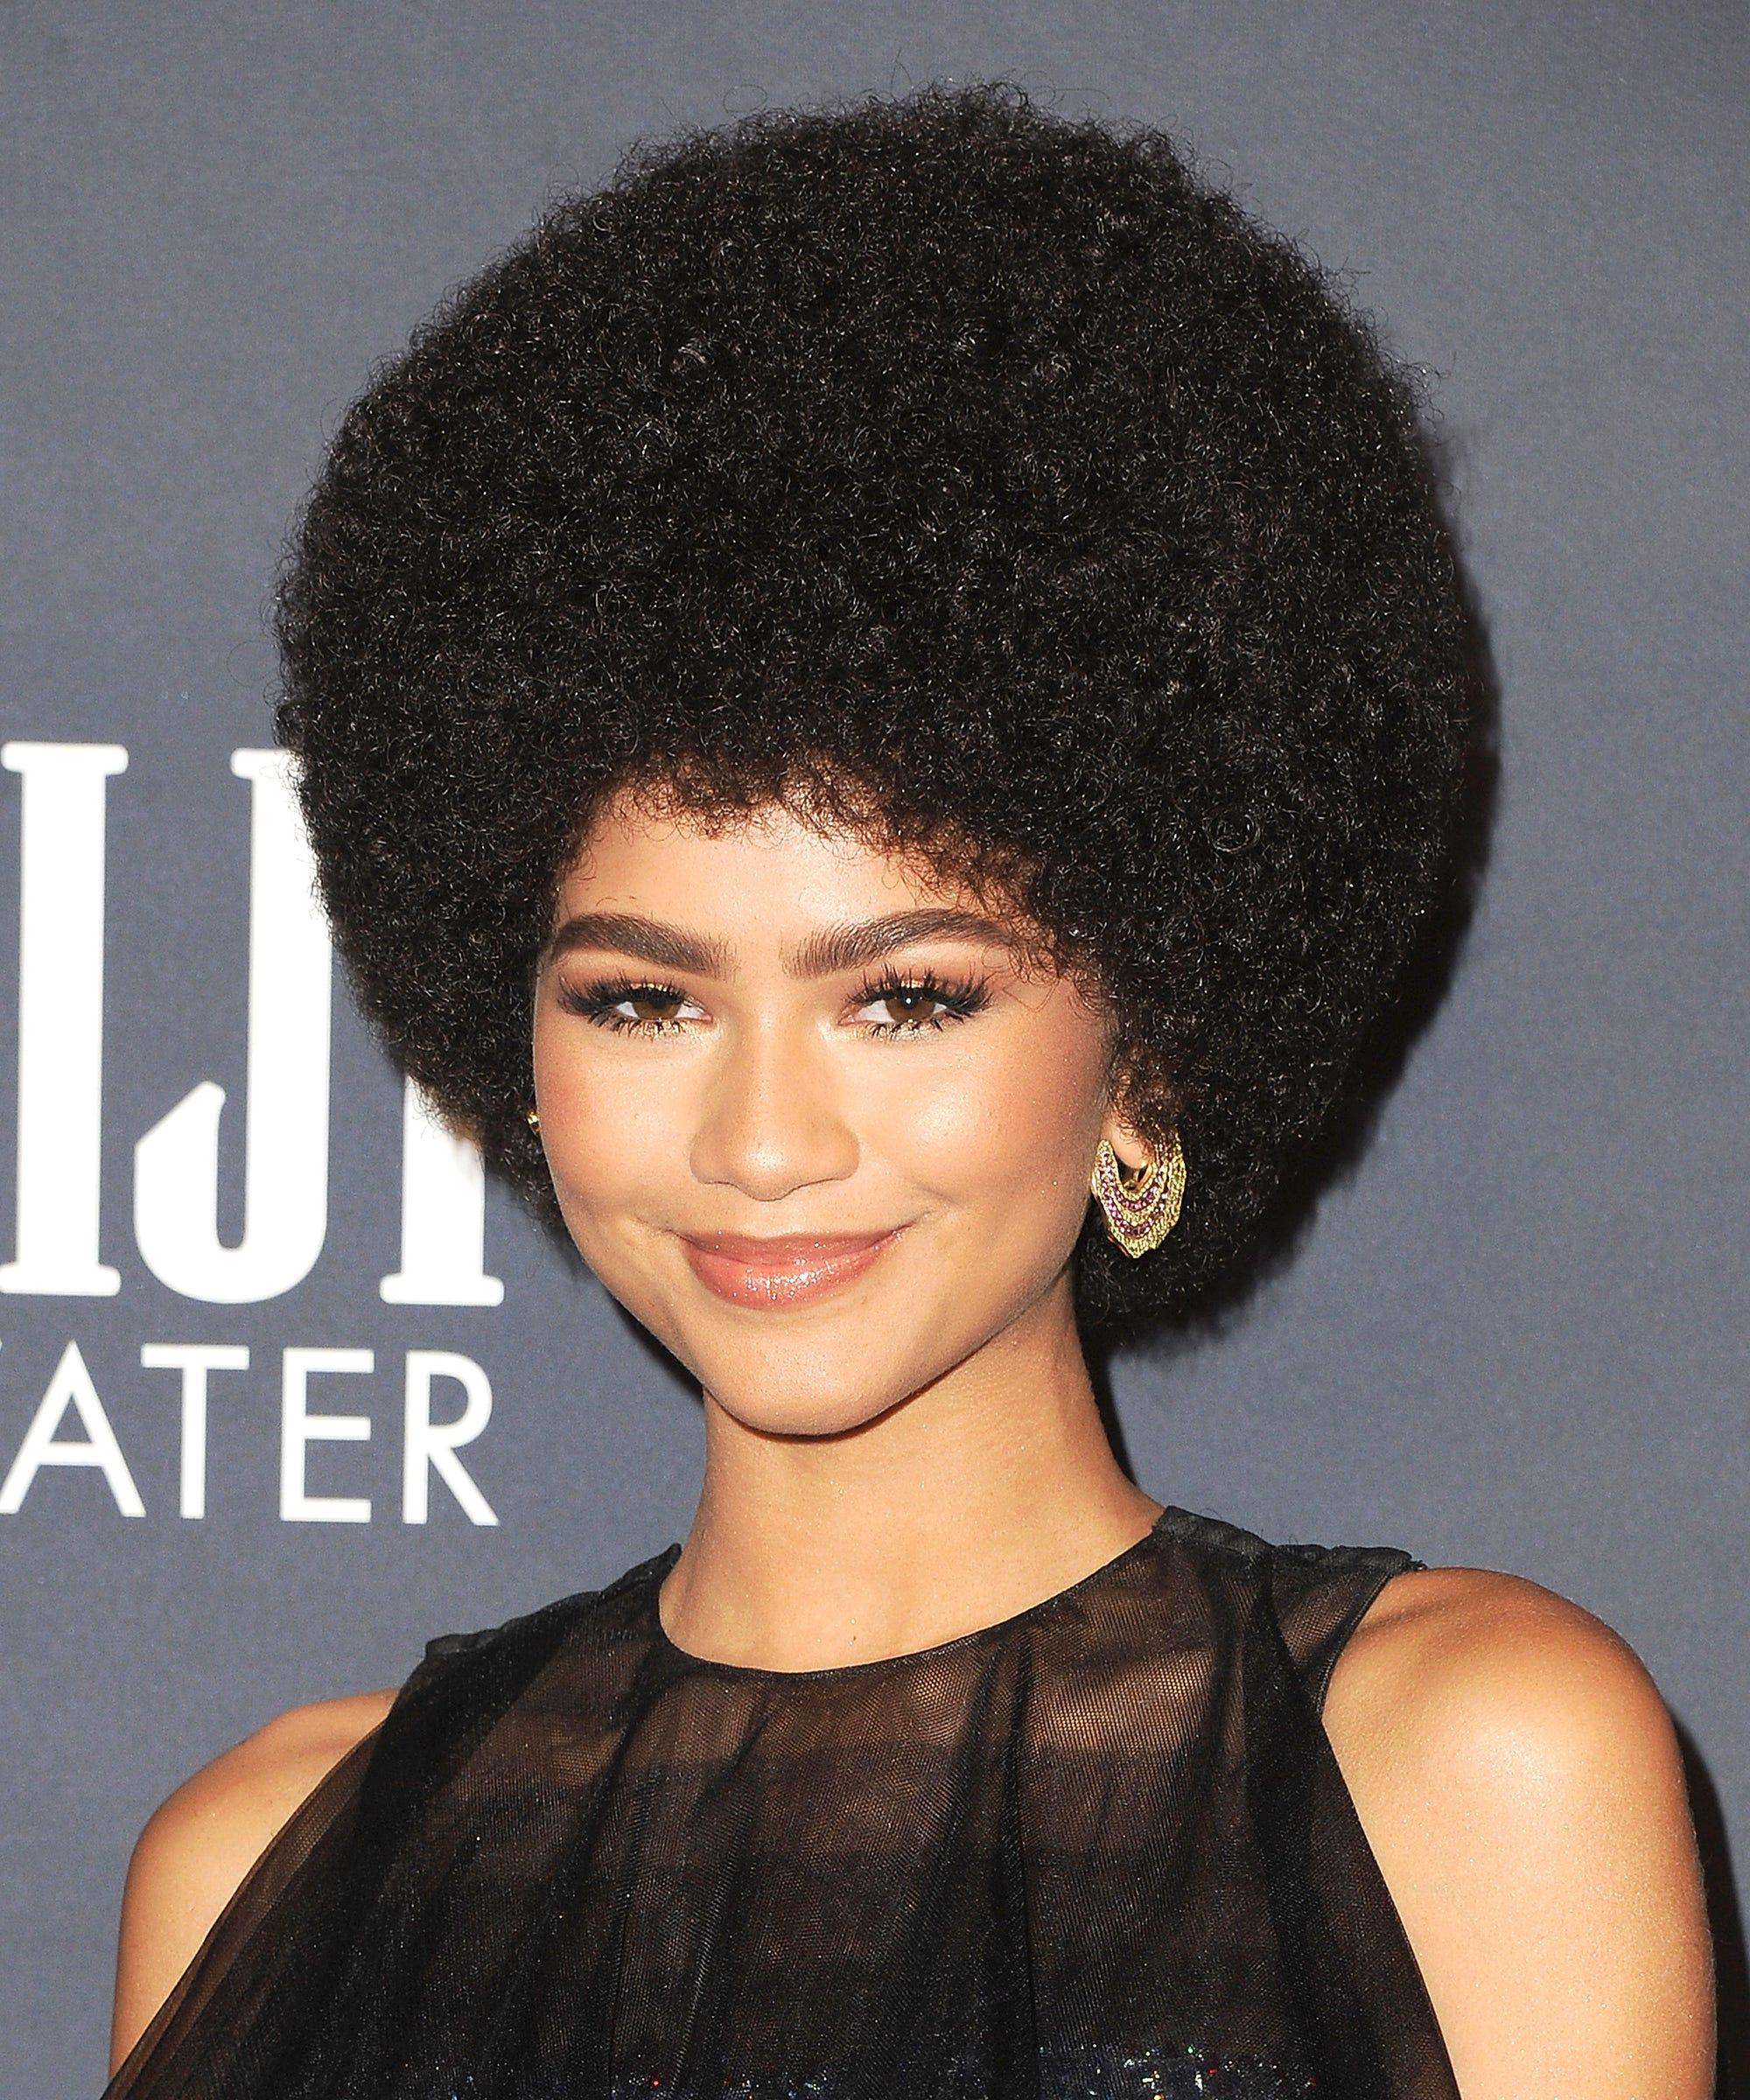 Zendaya Hair Afro Instagram Kim Kimble Instyle Awards